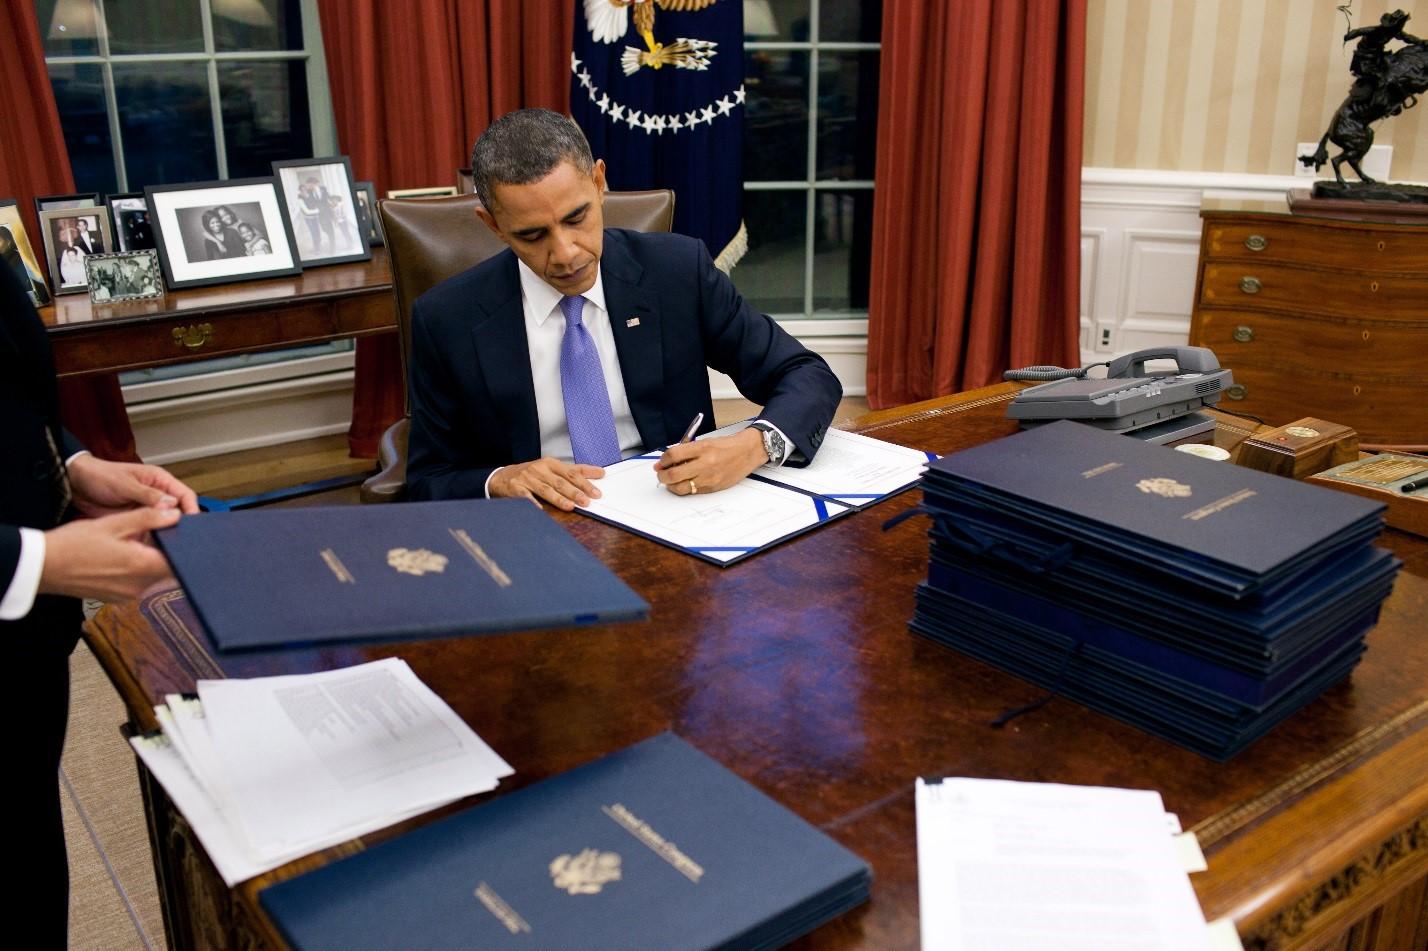 President Obama Signing Legislation.